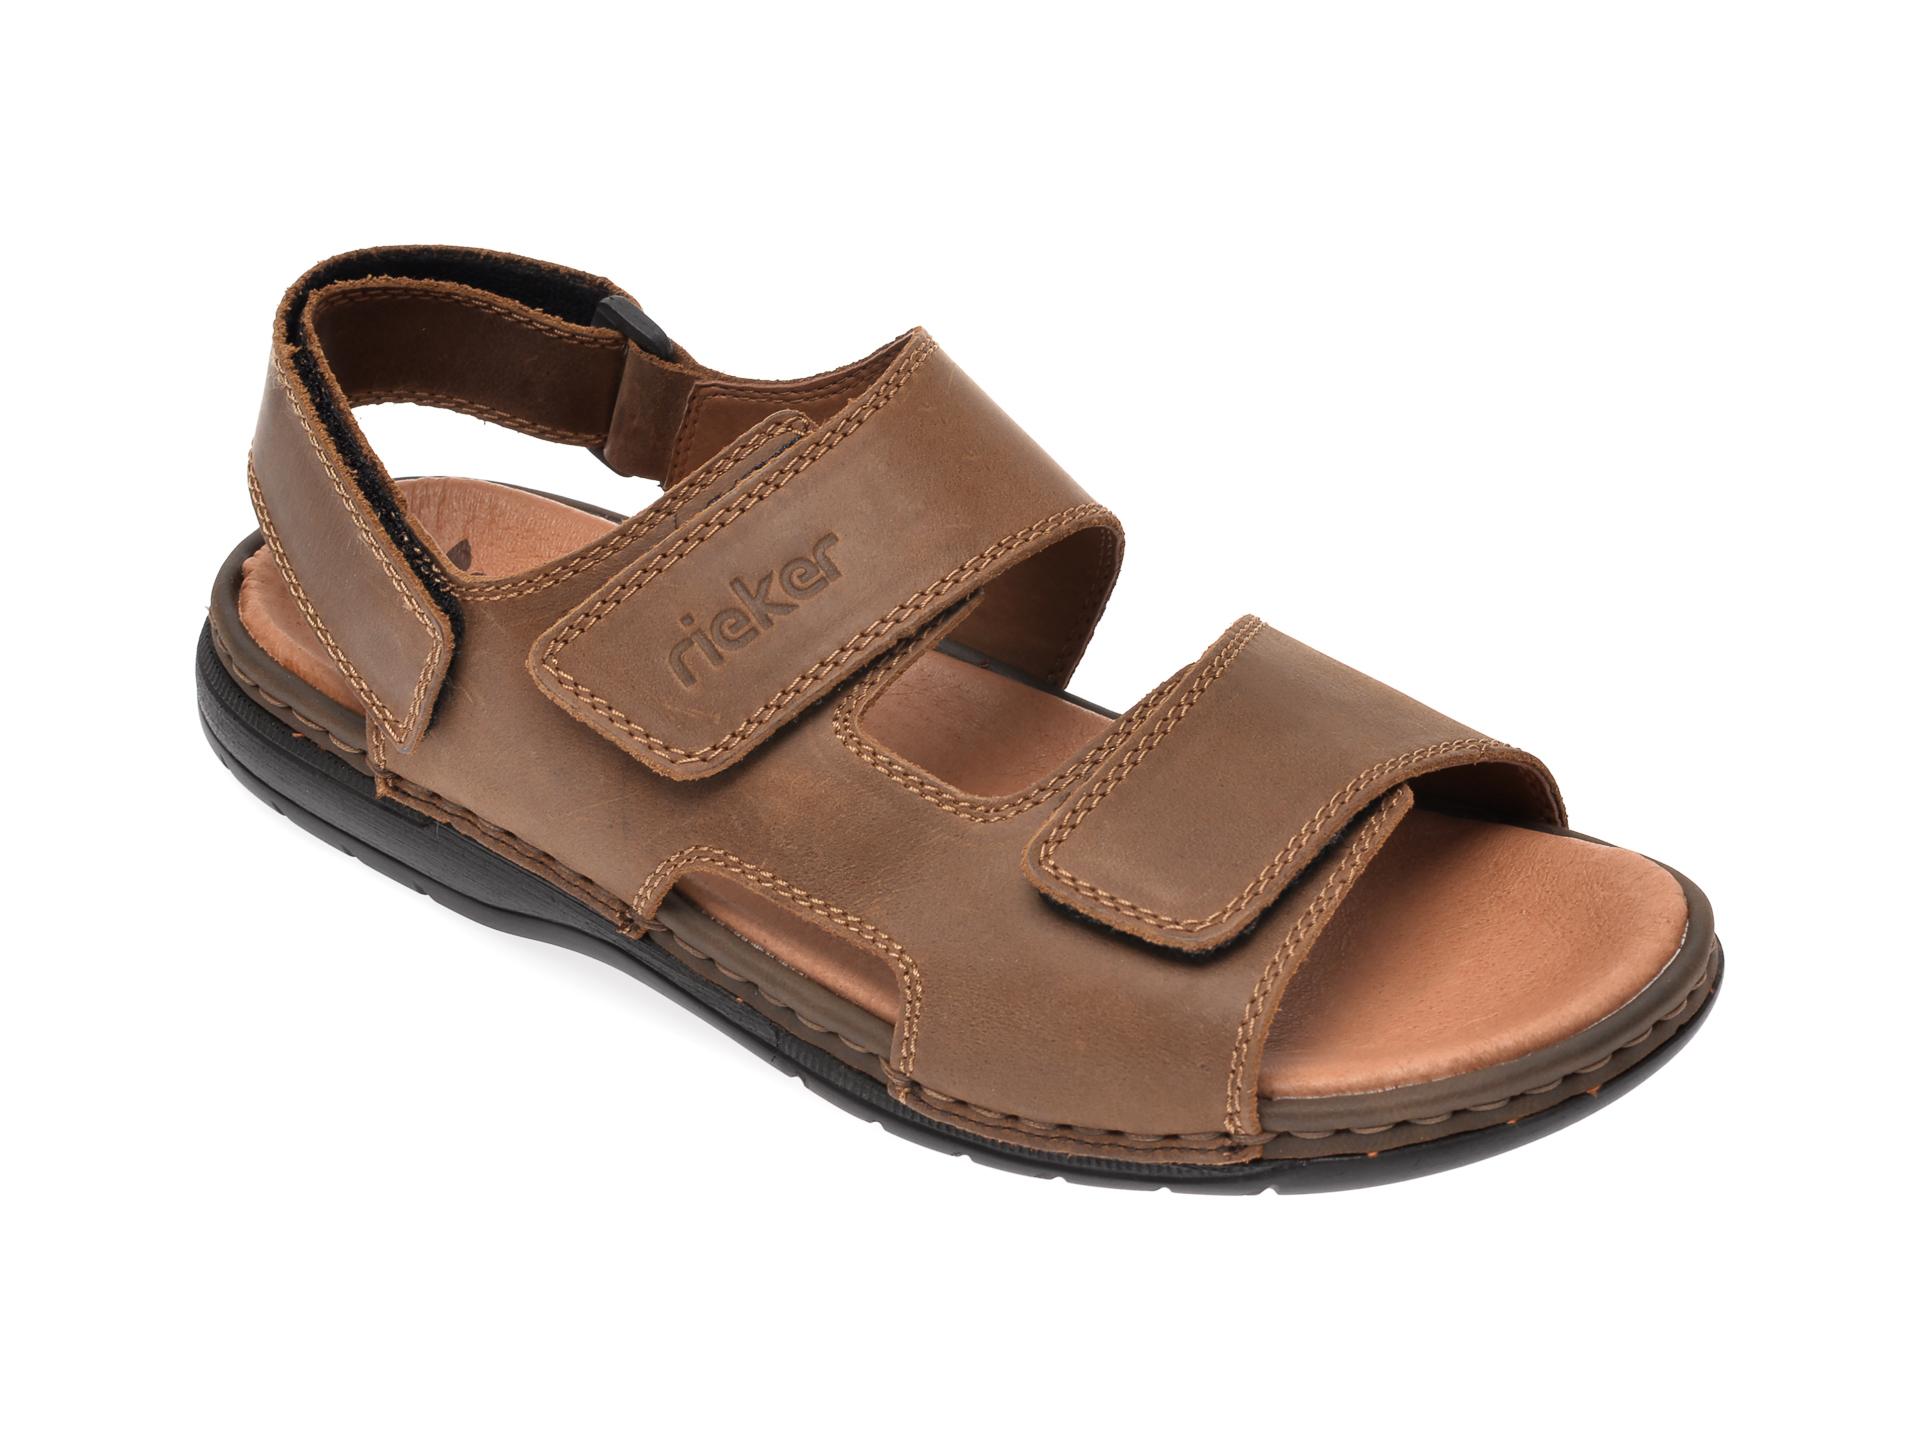 Sandale RIEKER maro, 25558, din piele naturala imagine